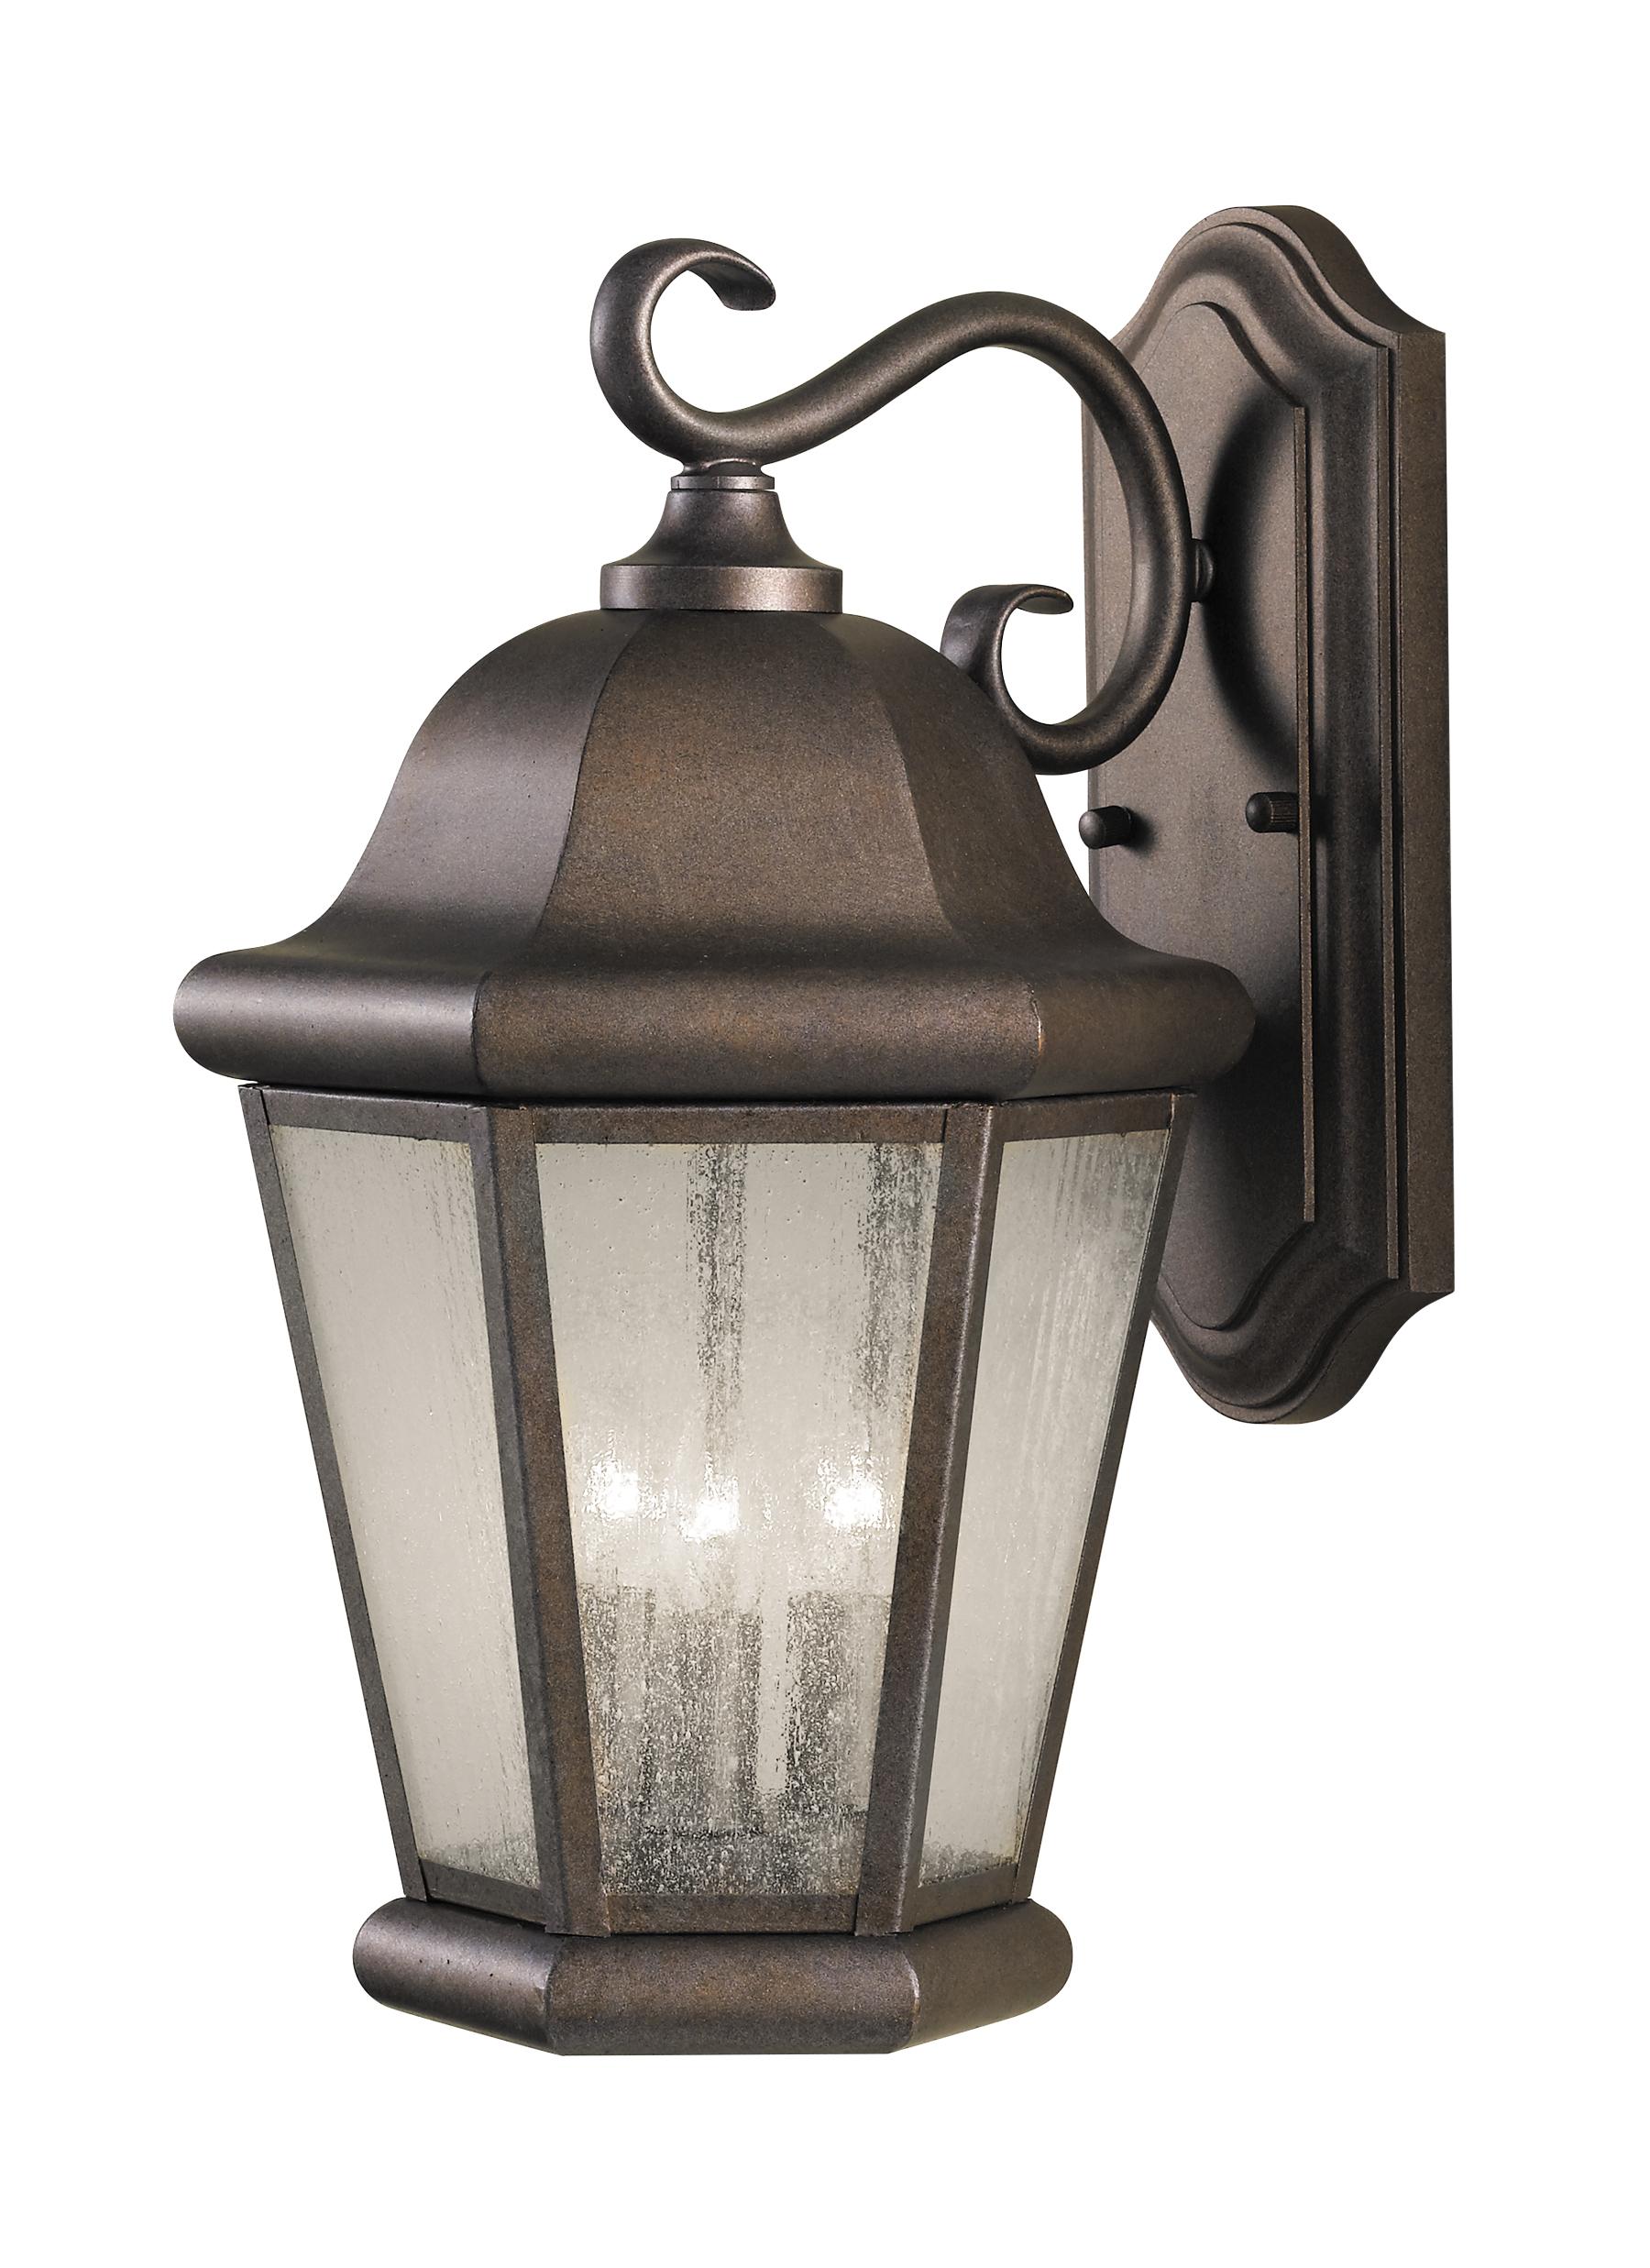 Feiss Outdoor Lighting Ol5902cb3 light wall lanterncorinthian bronze loading zoom workwithnaturefo